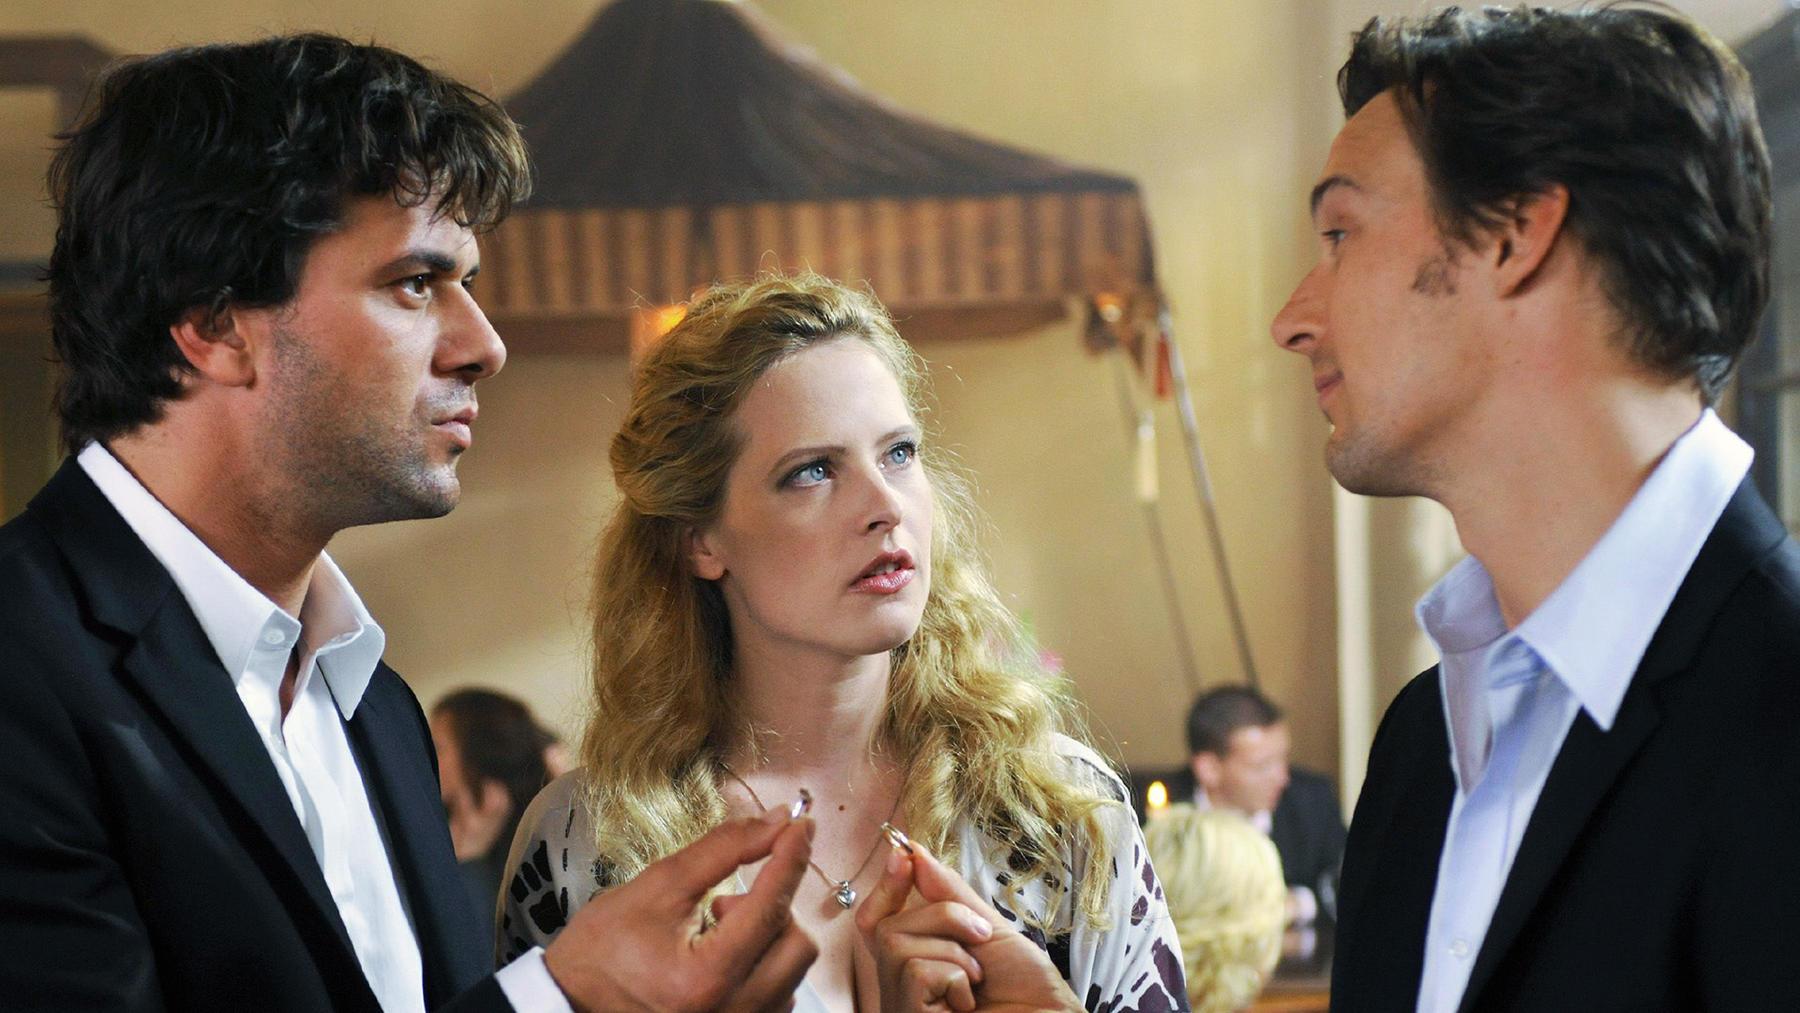 Romantisch: Drei Männer auf Haasenjagd